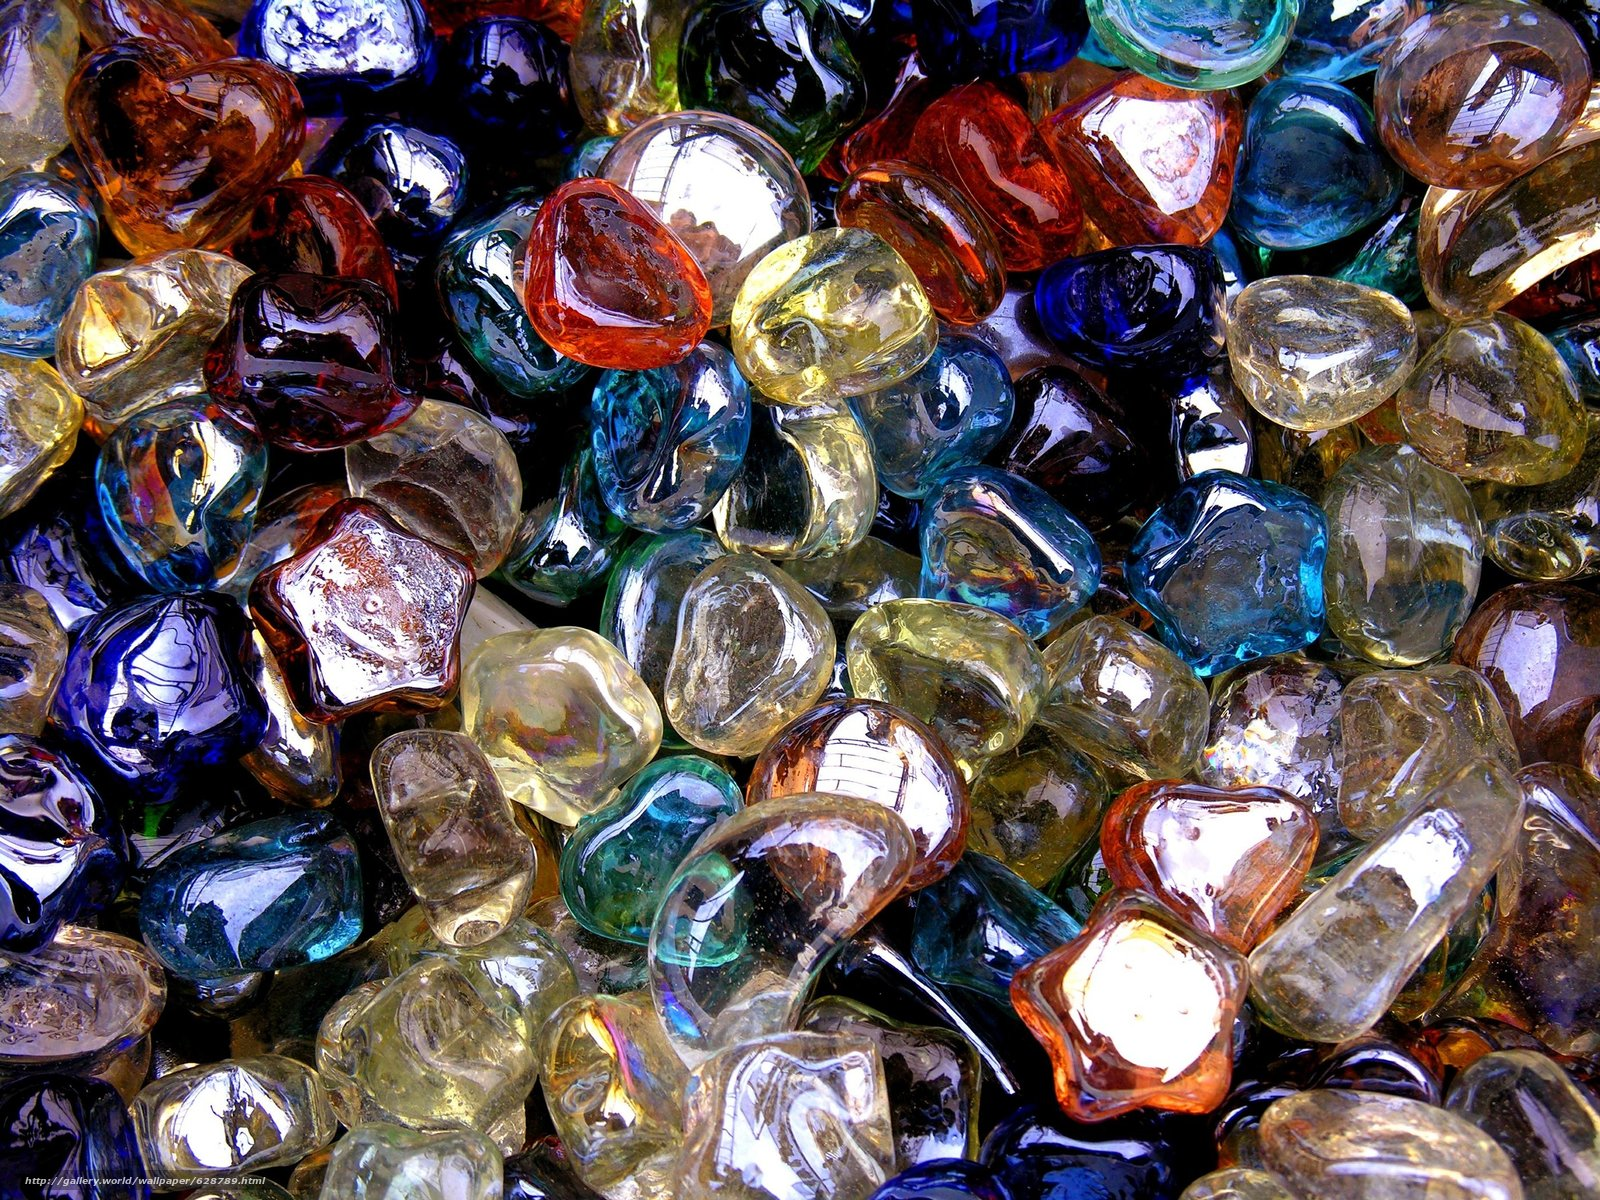 TEXTURA, Multicolorido, Pedras de vidro